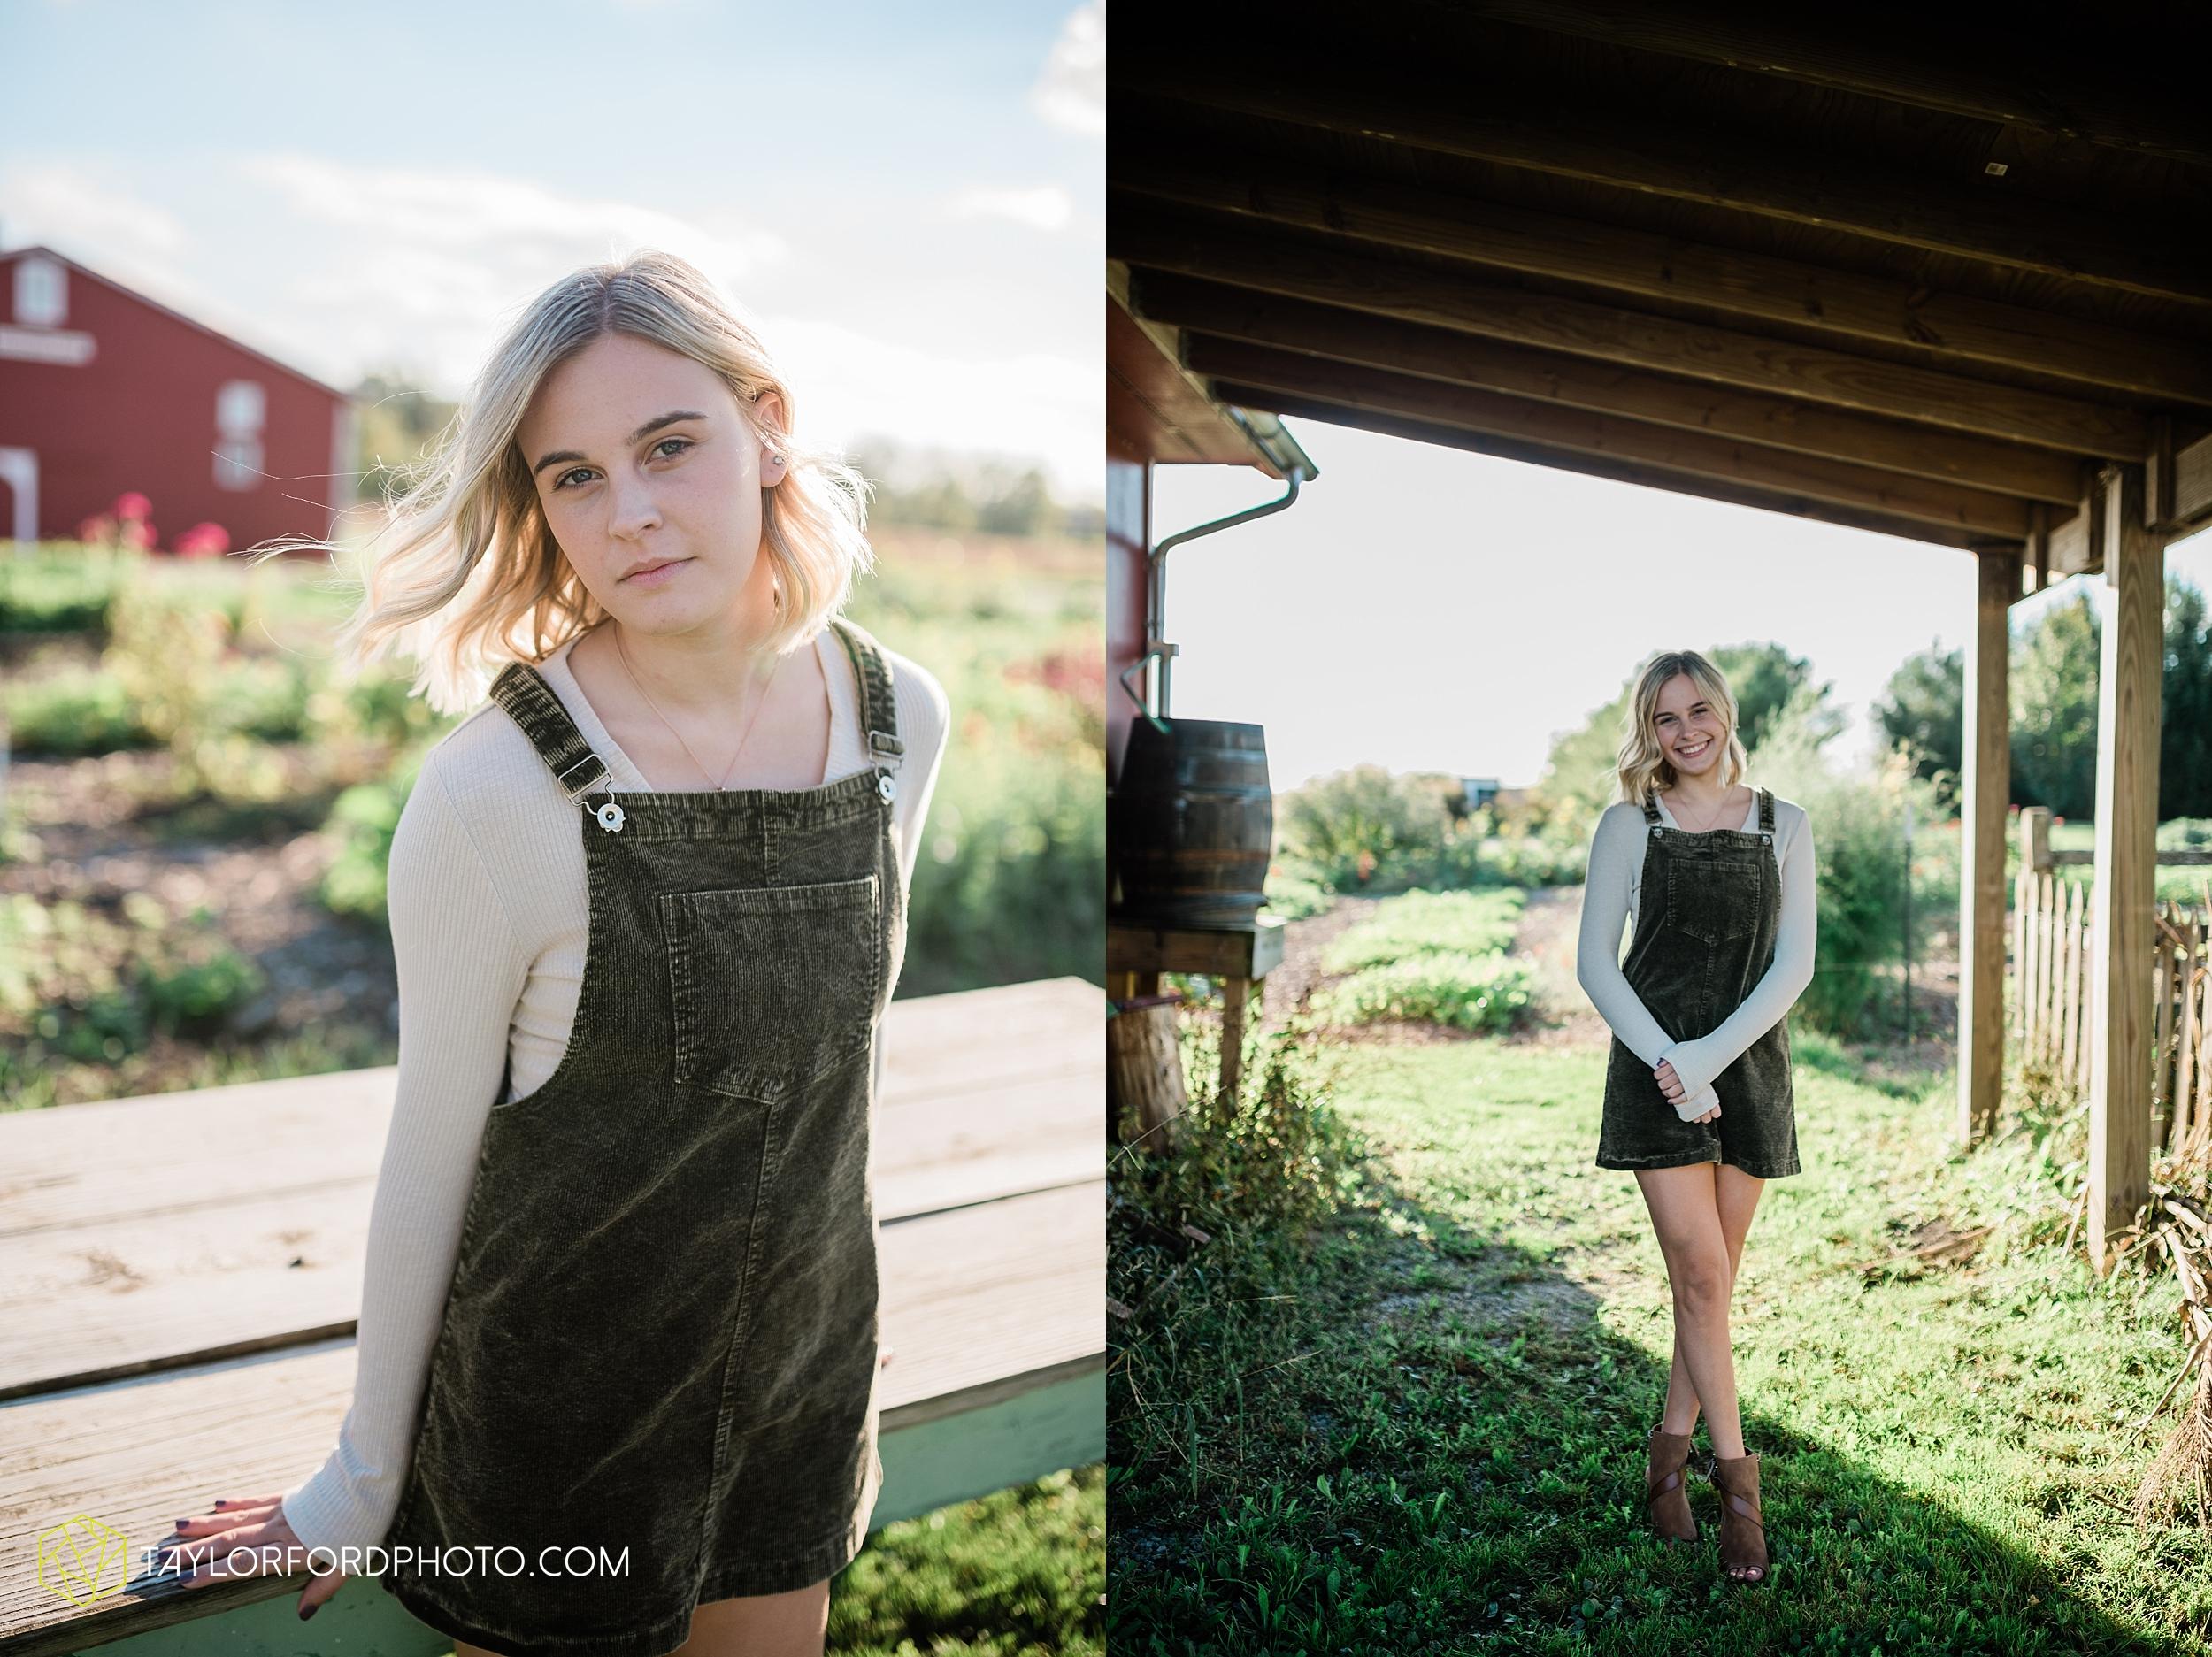 van-wert-high-school-ohio-senior-girl-downtown-cougar-photographer-taylor-ford-photography_0938.jpg